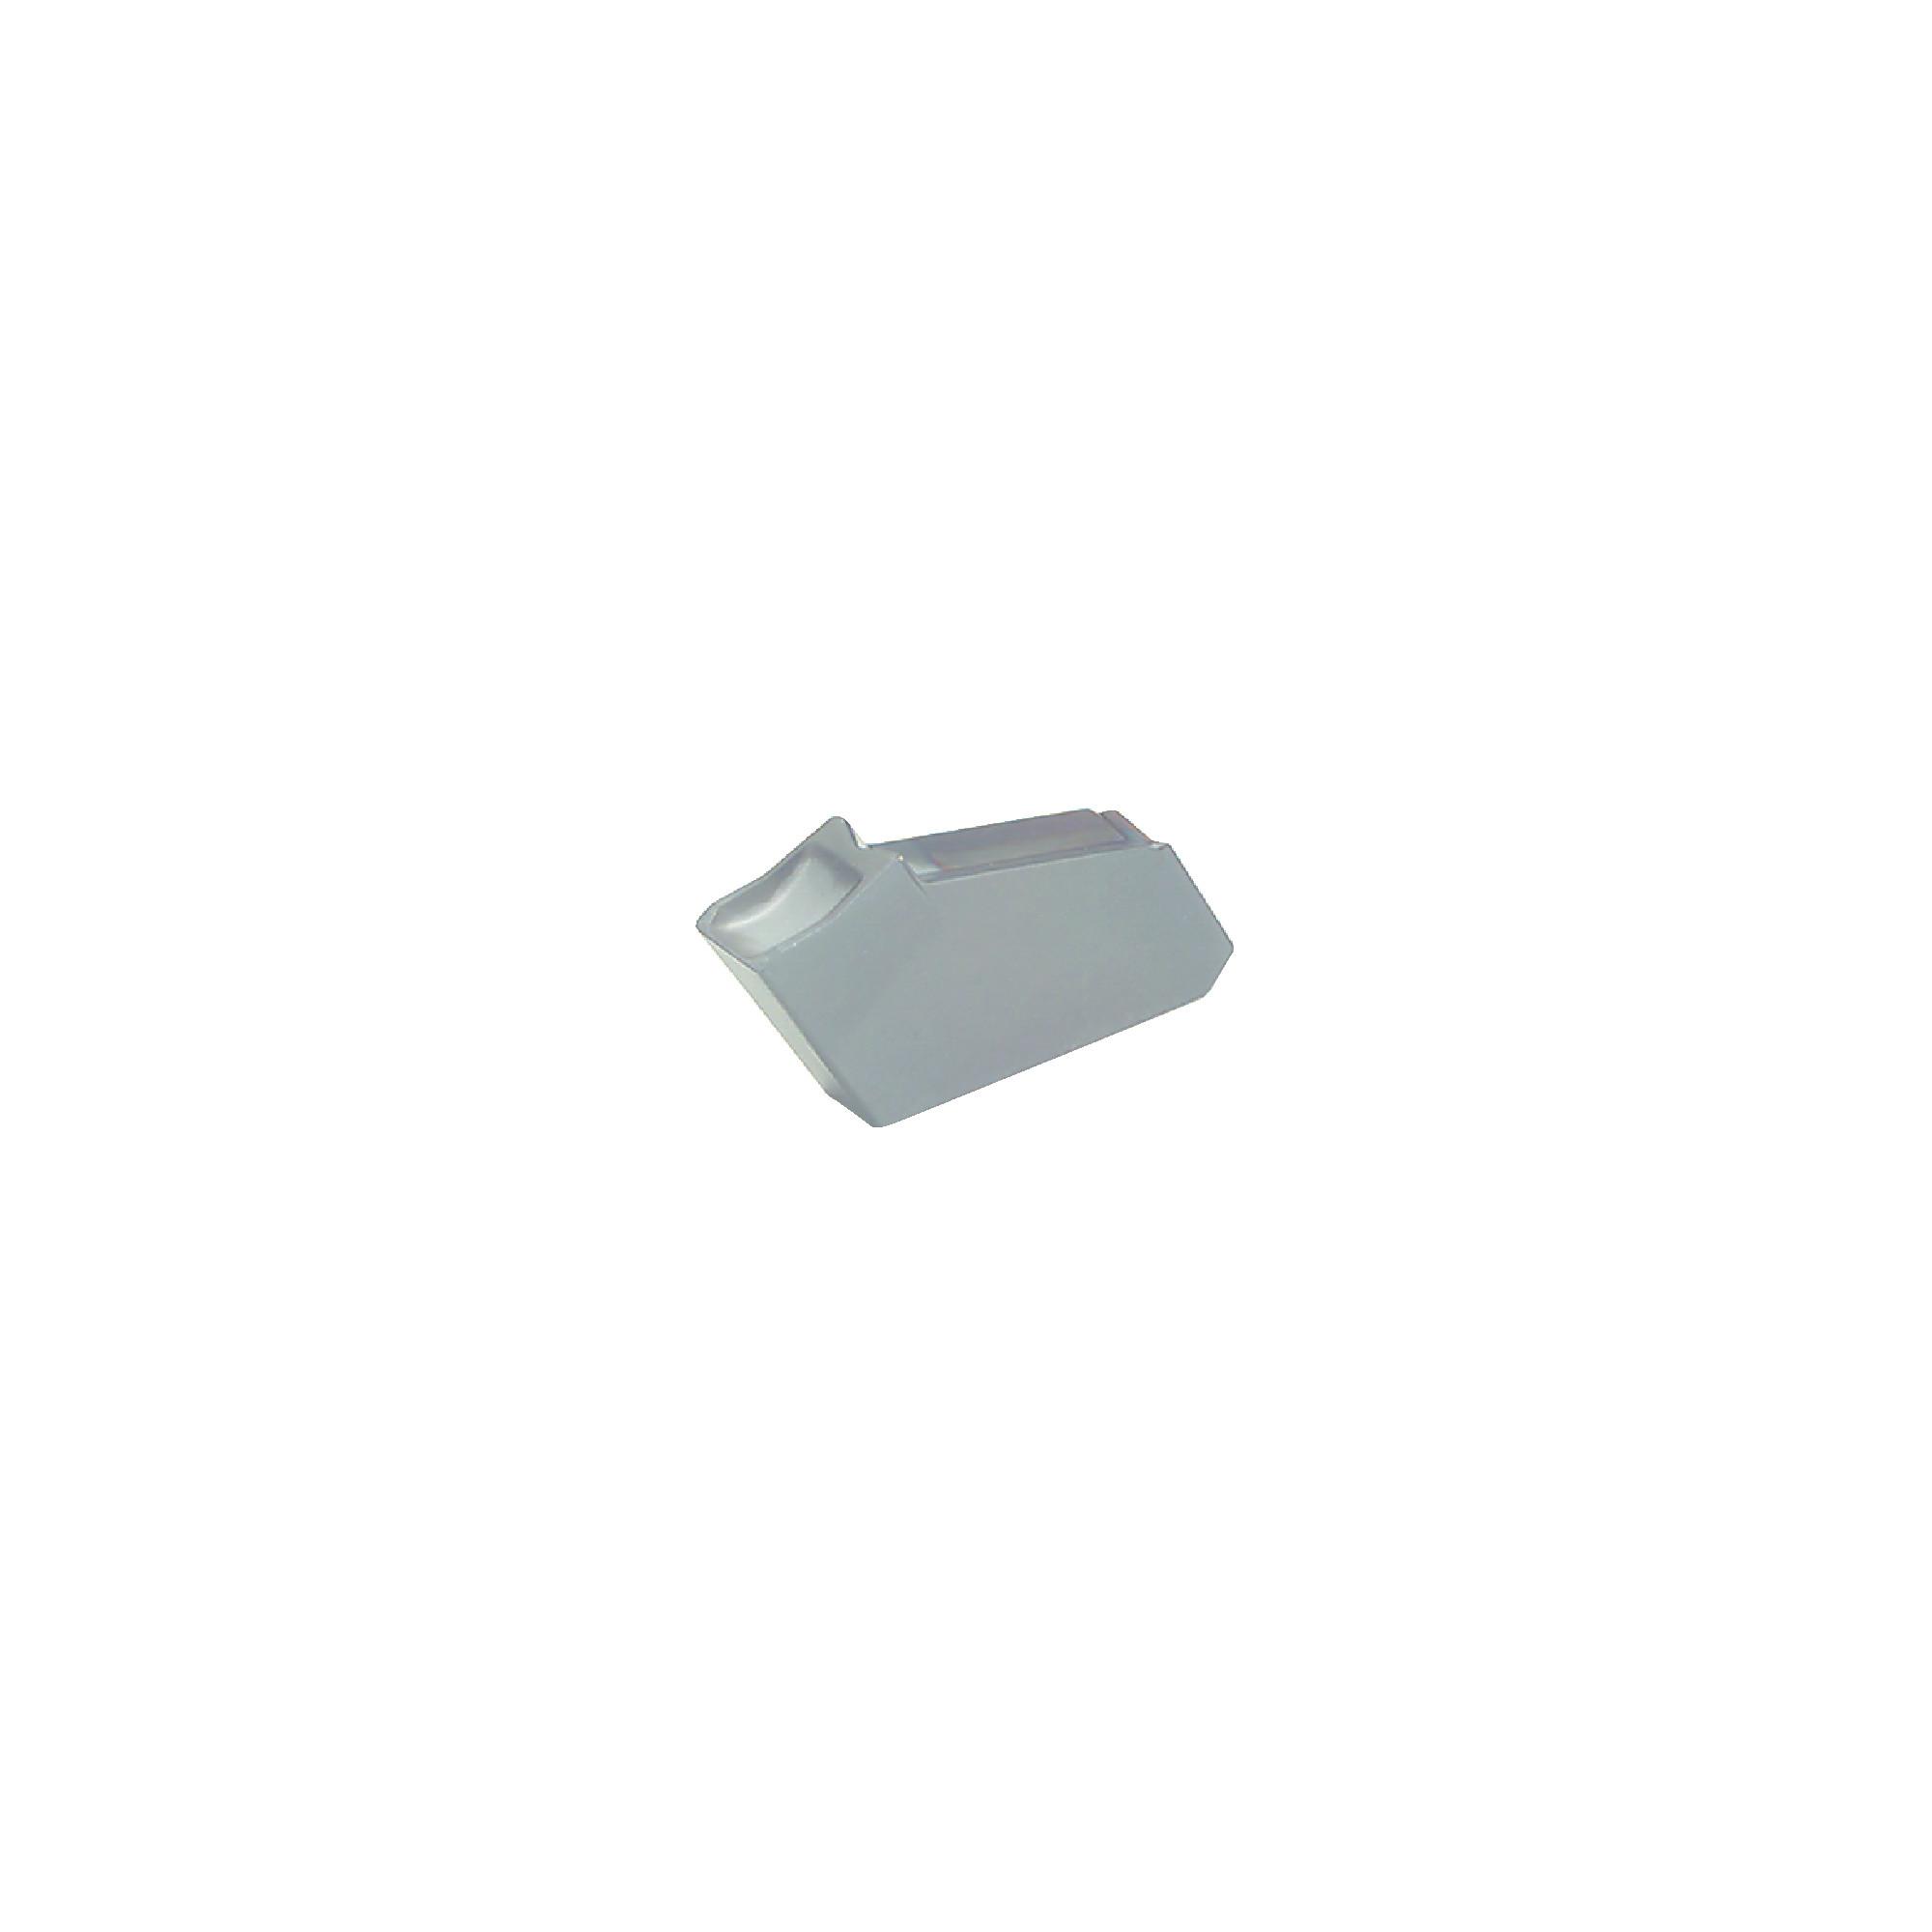 "ISCAR - GFN-3 IC328 / GFN - SELF-GRIP Indexable Carbide Insert / 0.118"" Cutting Width"